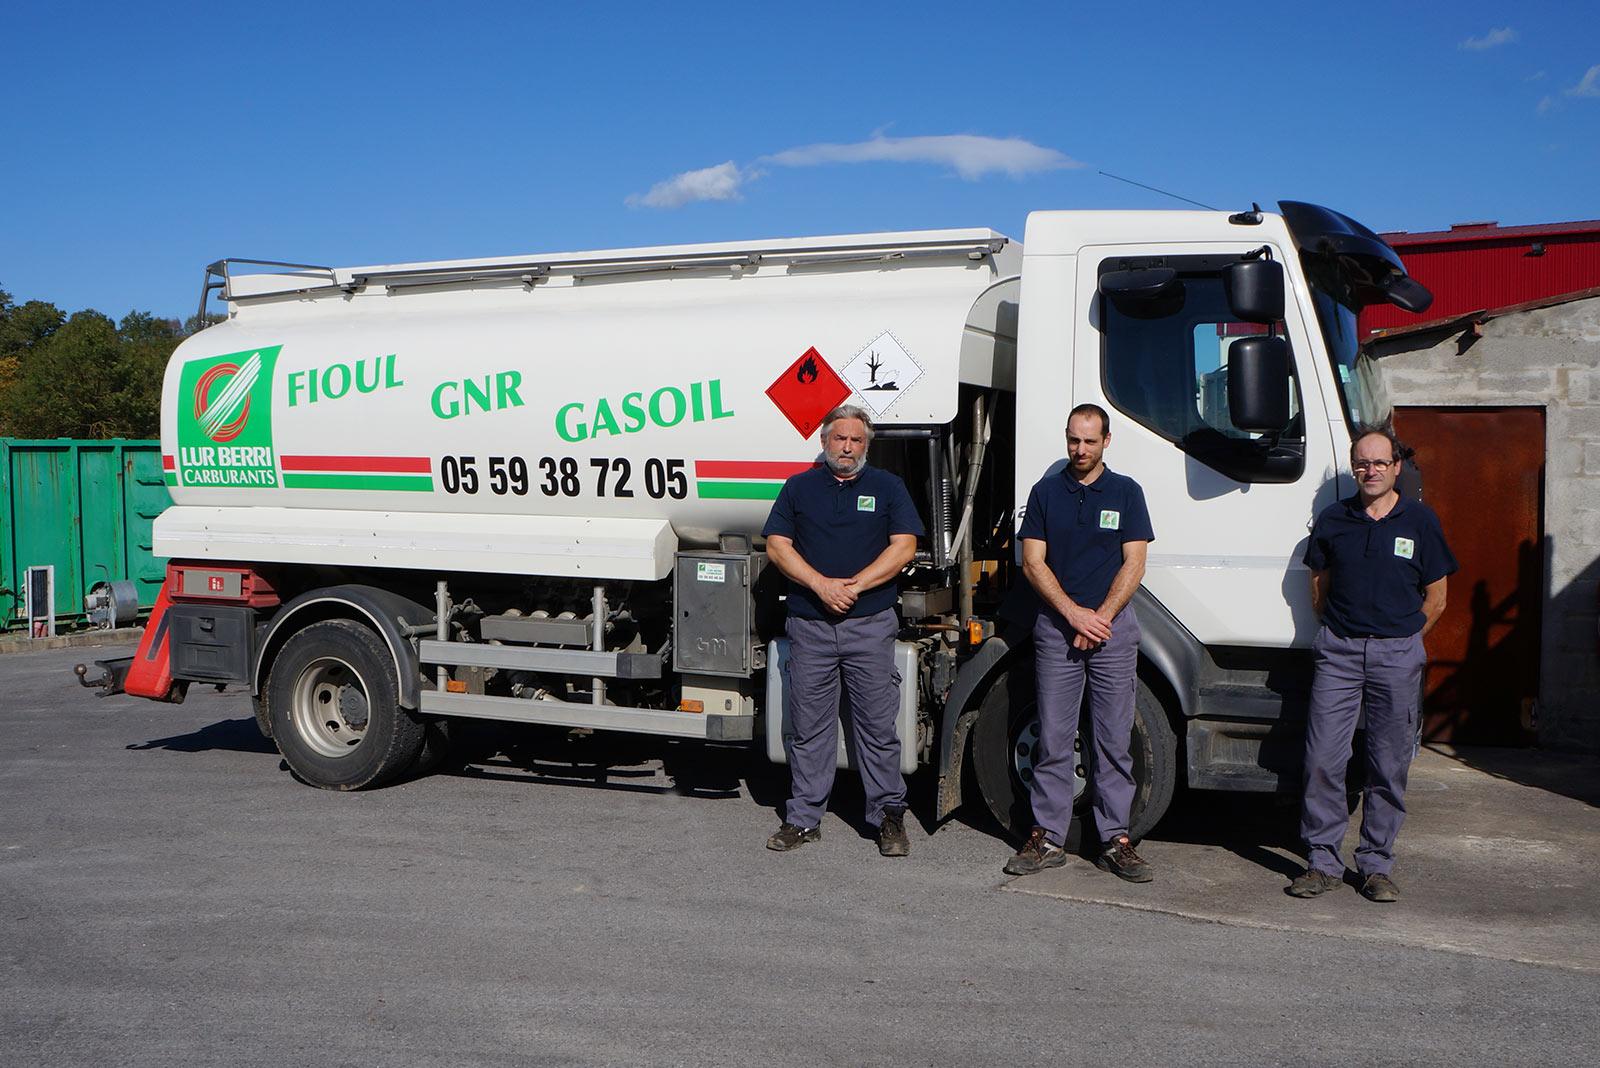 Equipe carburants